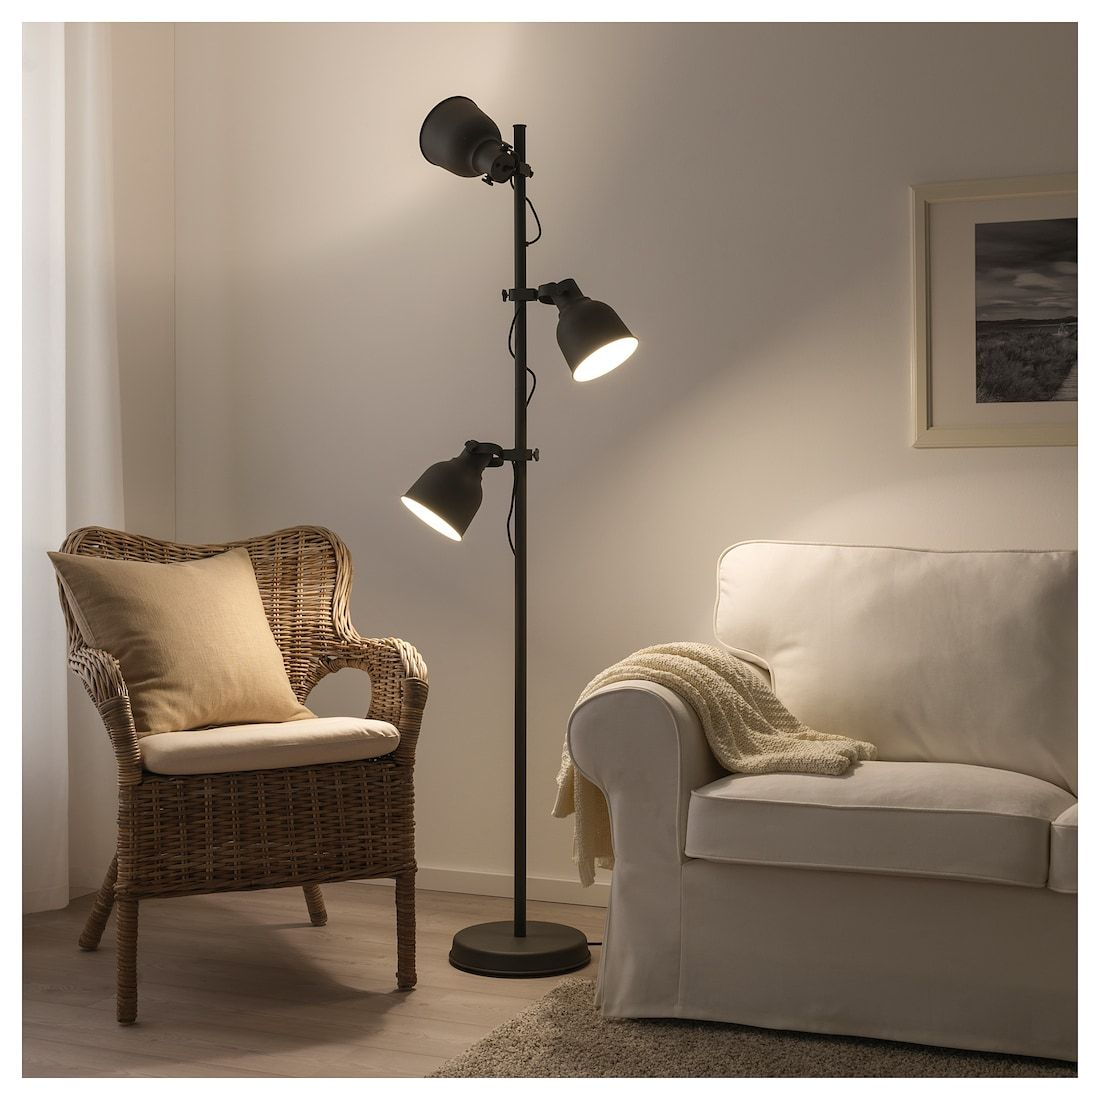 IKEA HEKTAR Dark Gray Floor lamp w/3spots and LED bulbs